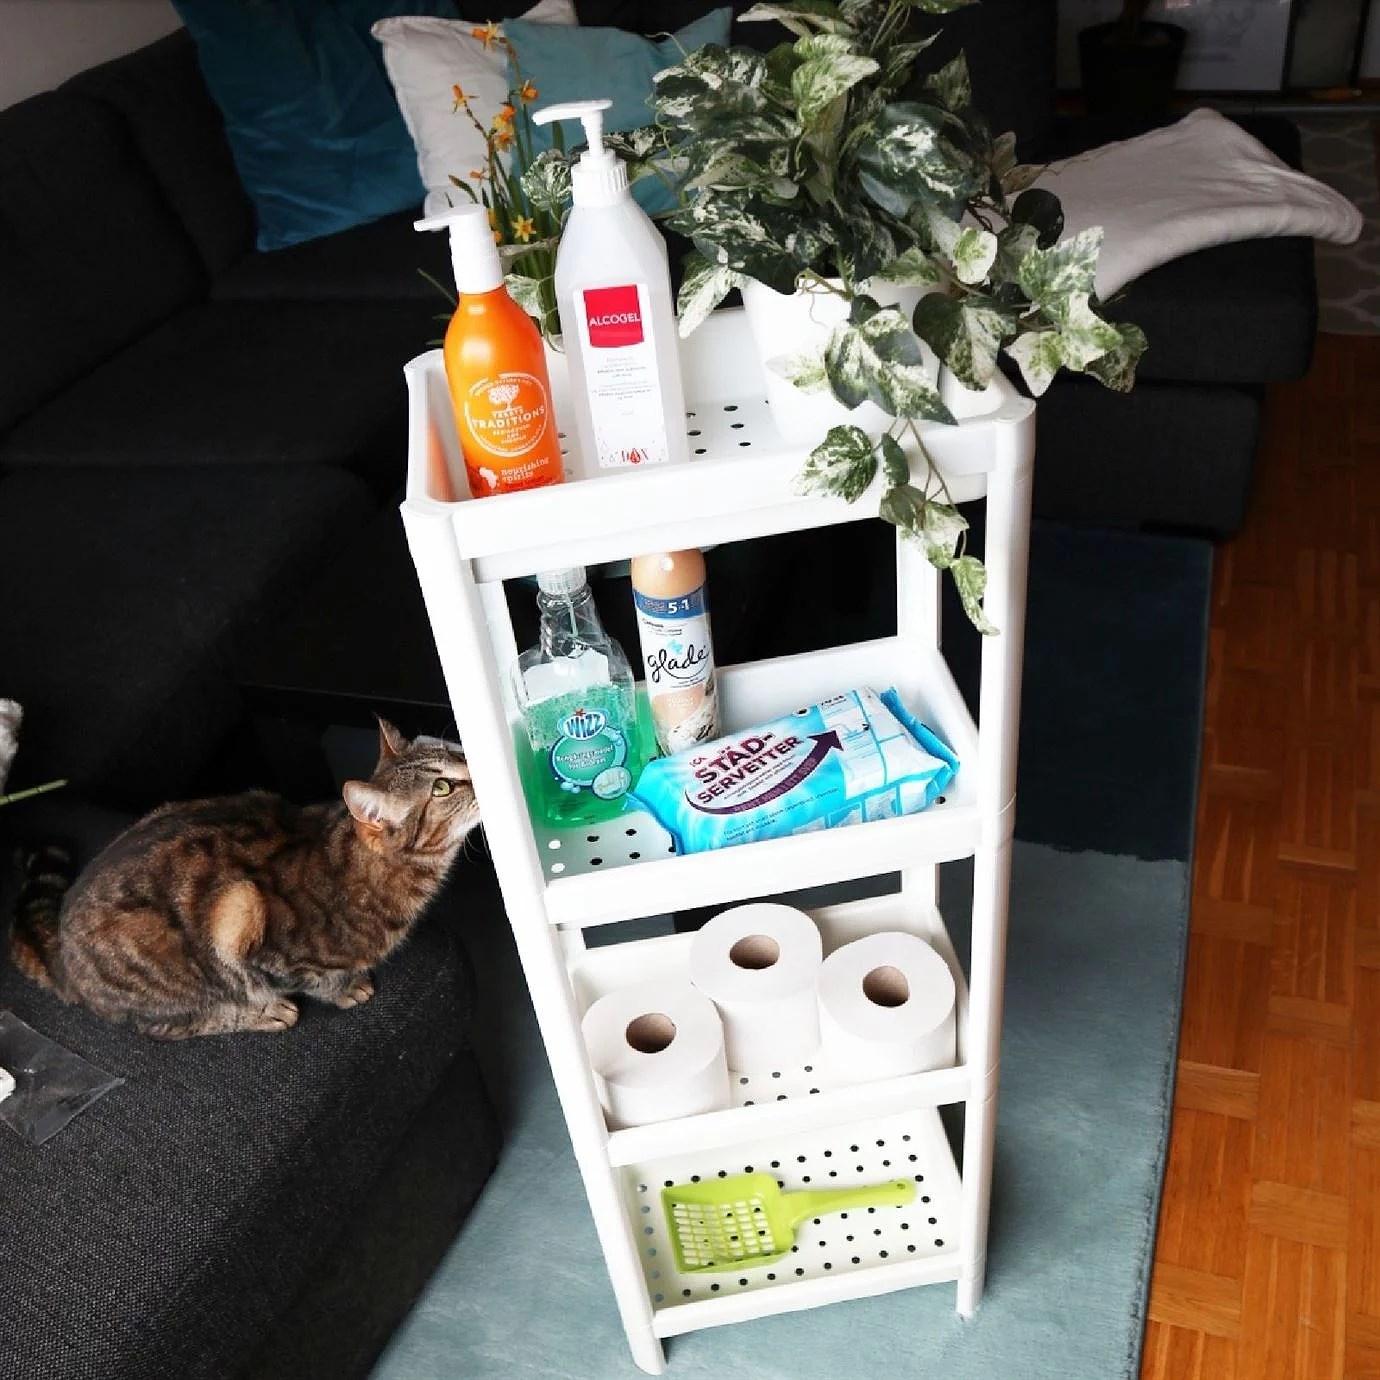 Badrumshylla 99 kr från IKEA